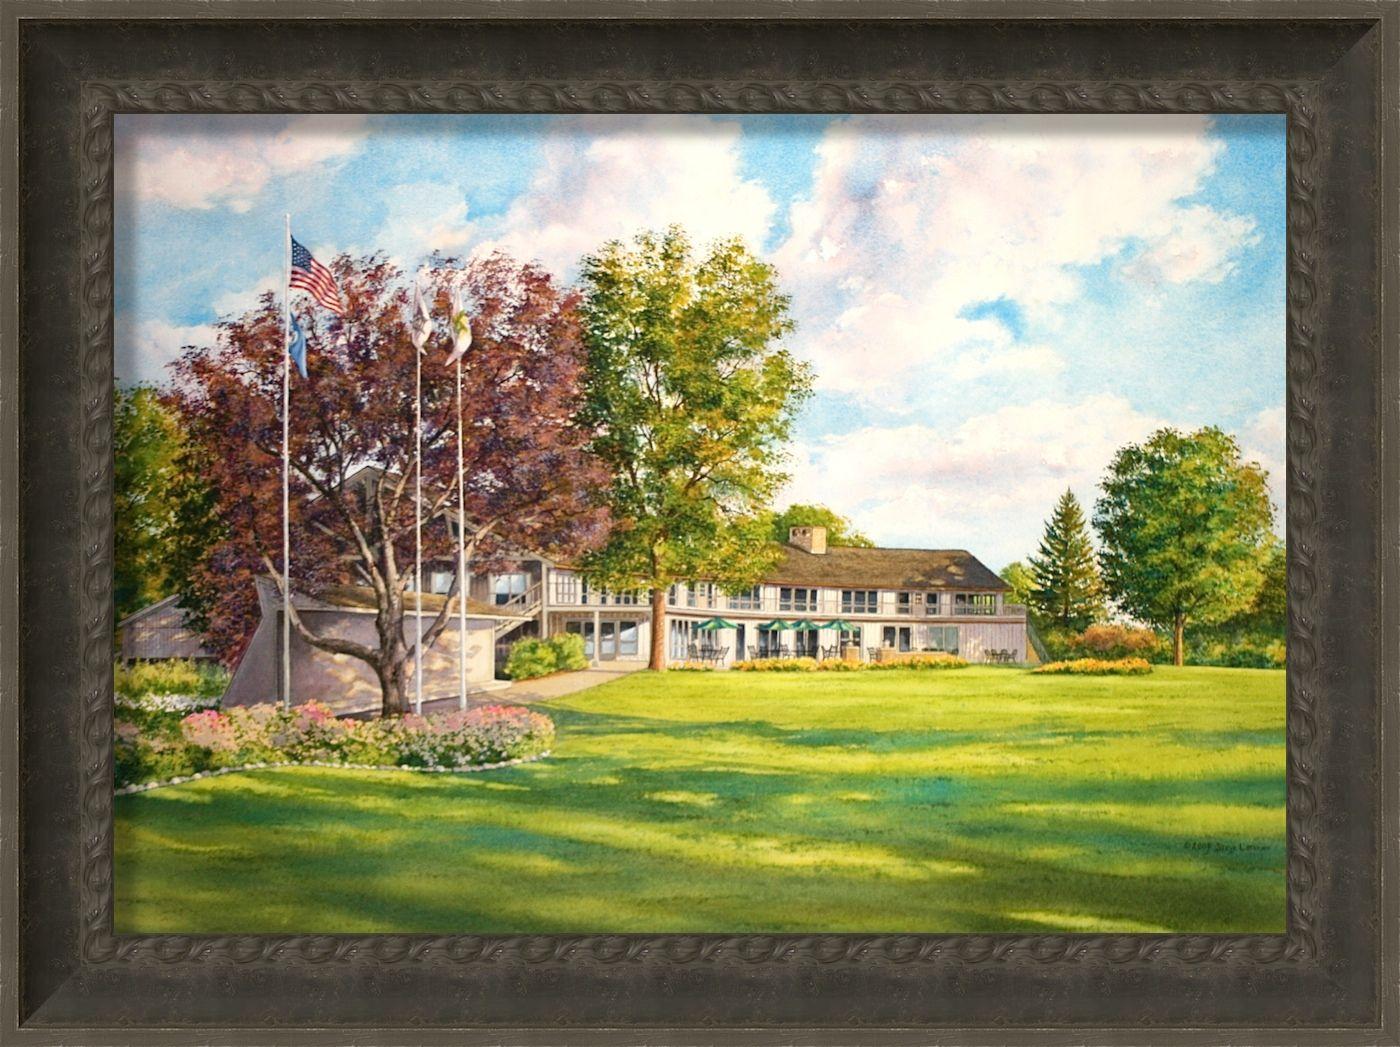 Hazeltine national golf club golf art by steve lotus